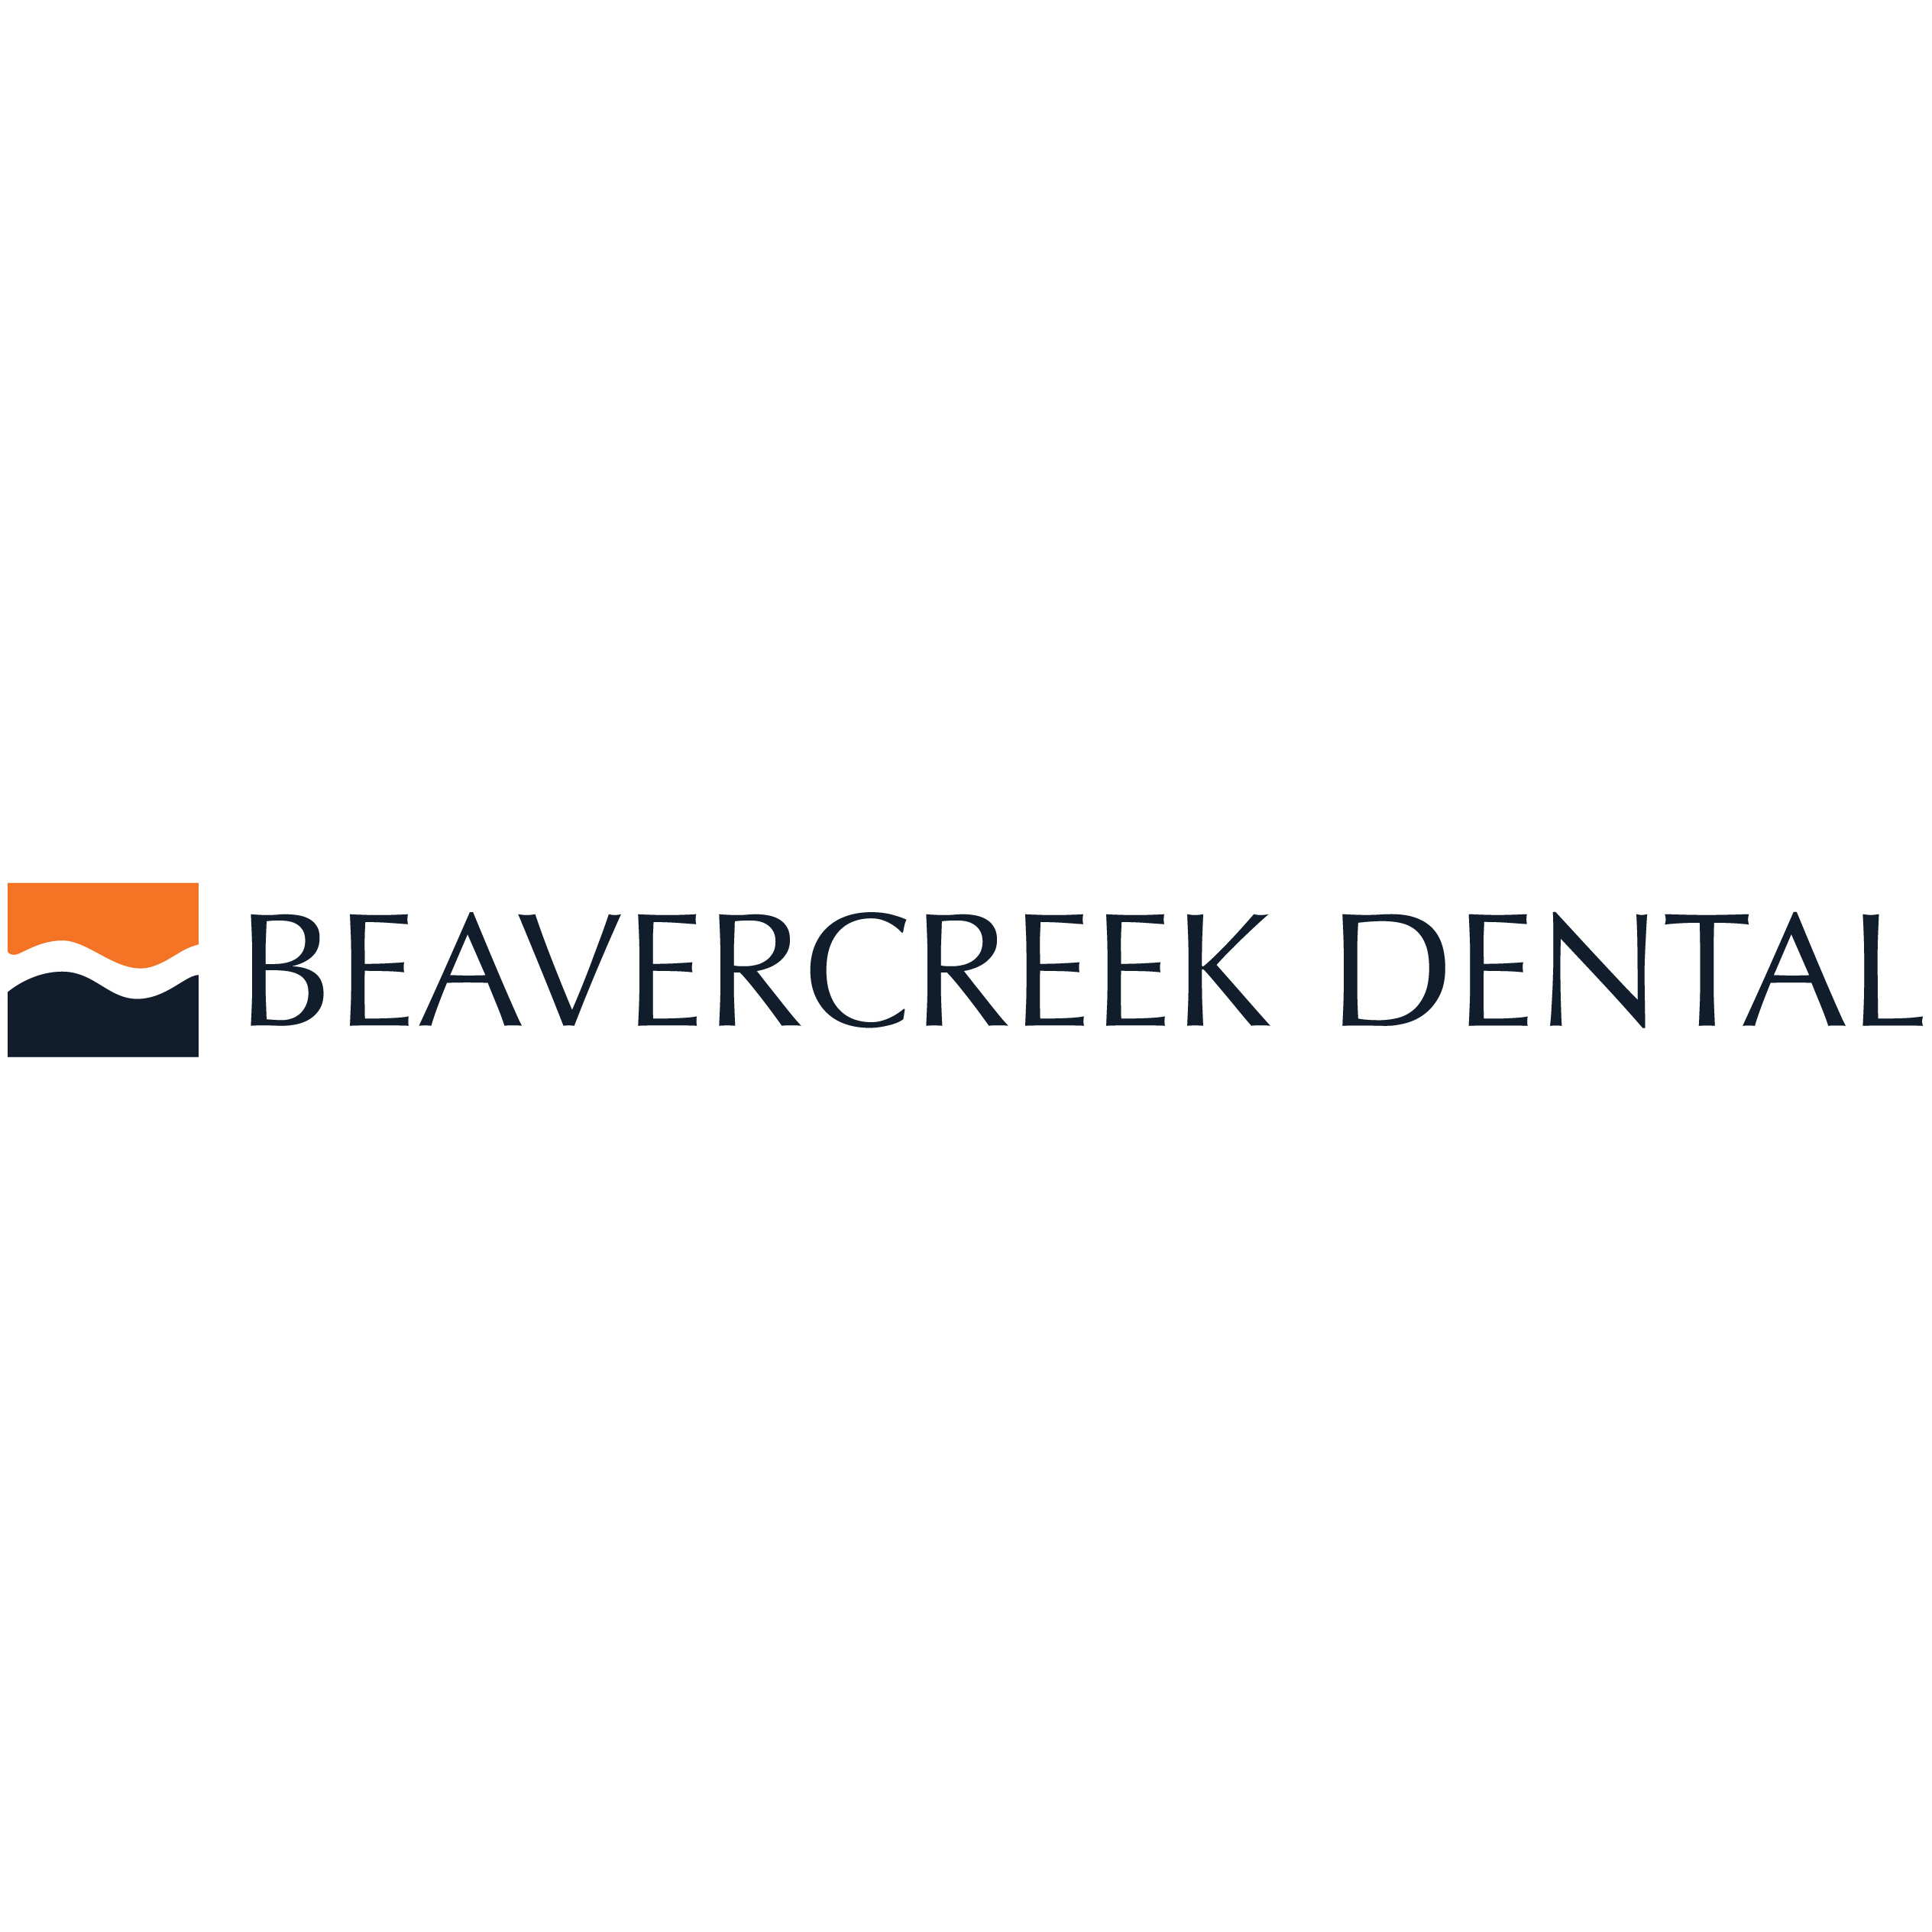 Beavercreek Dental